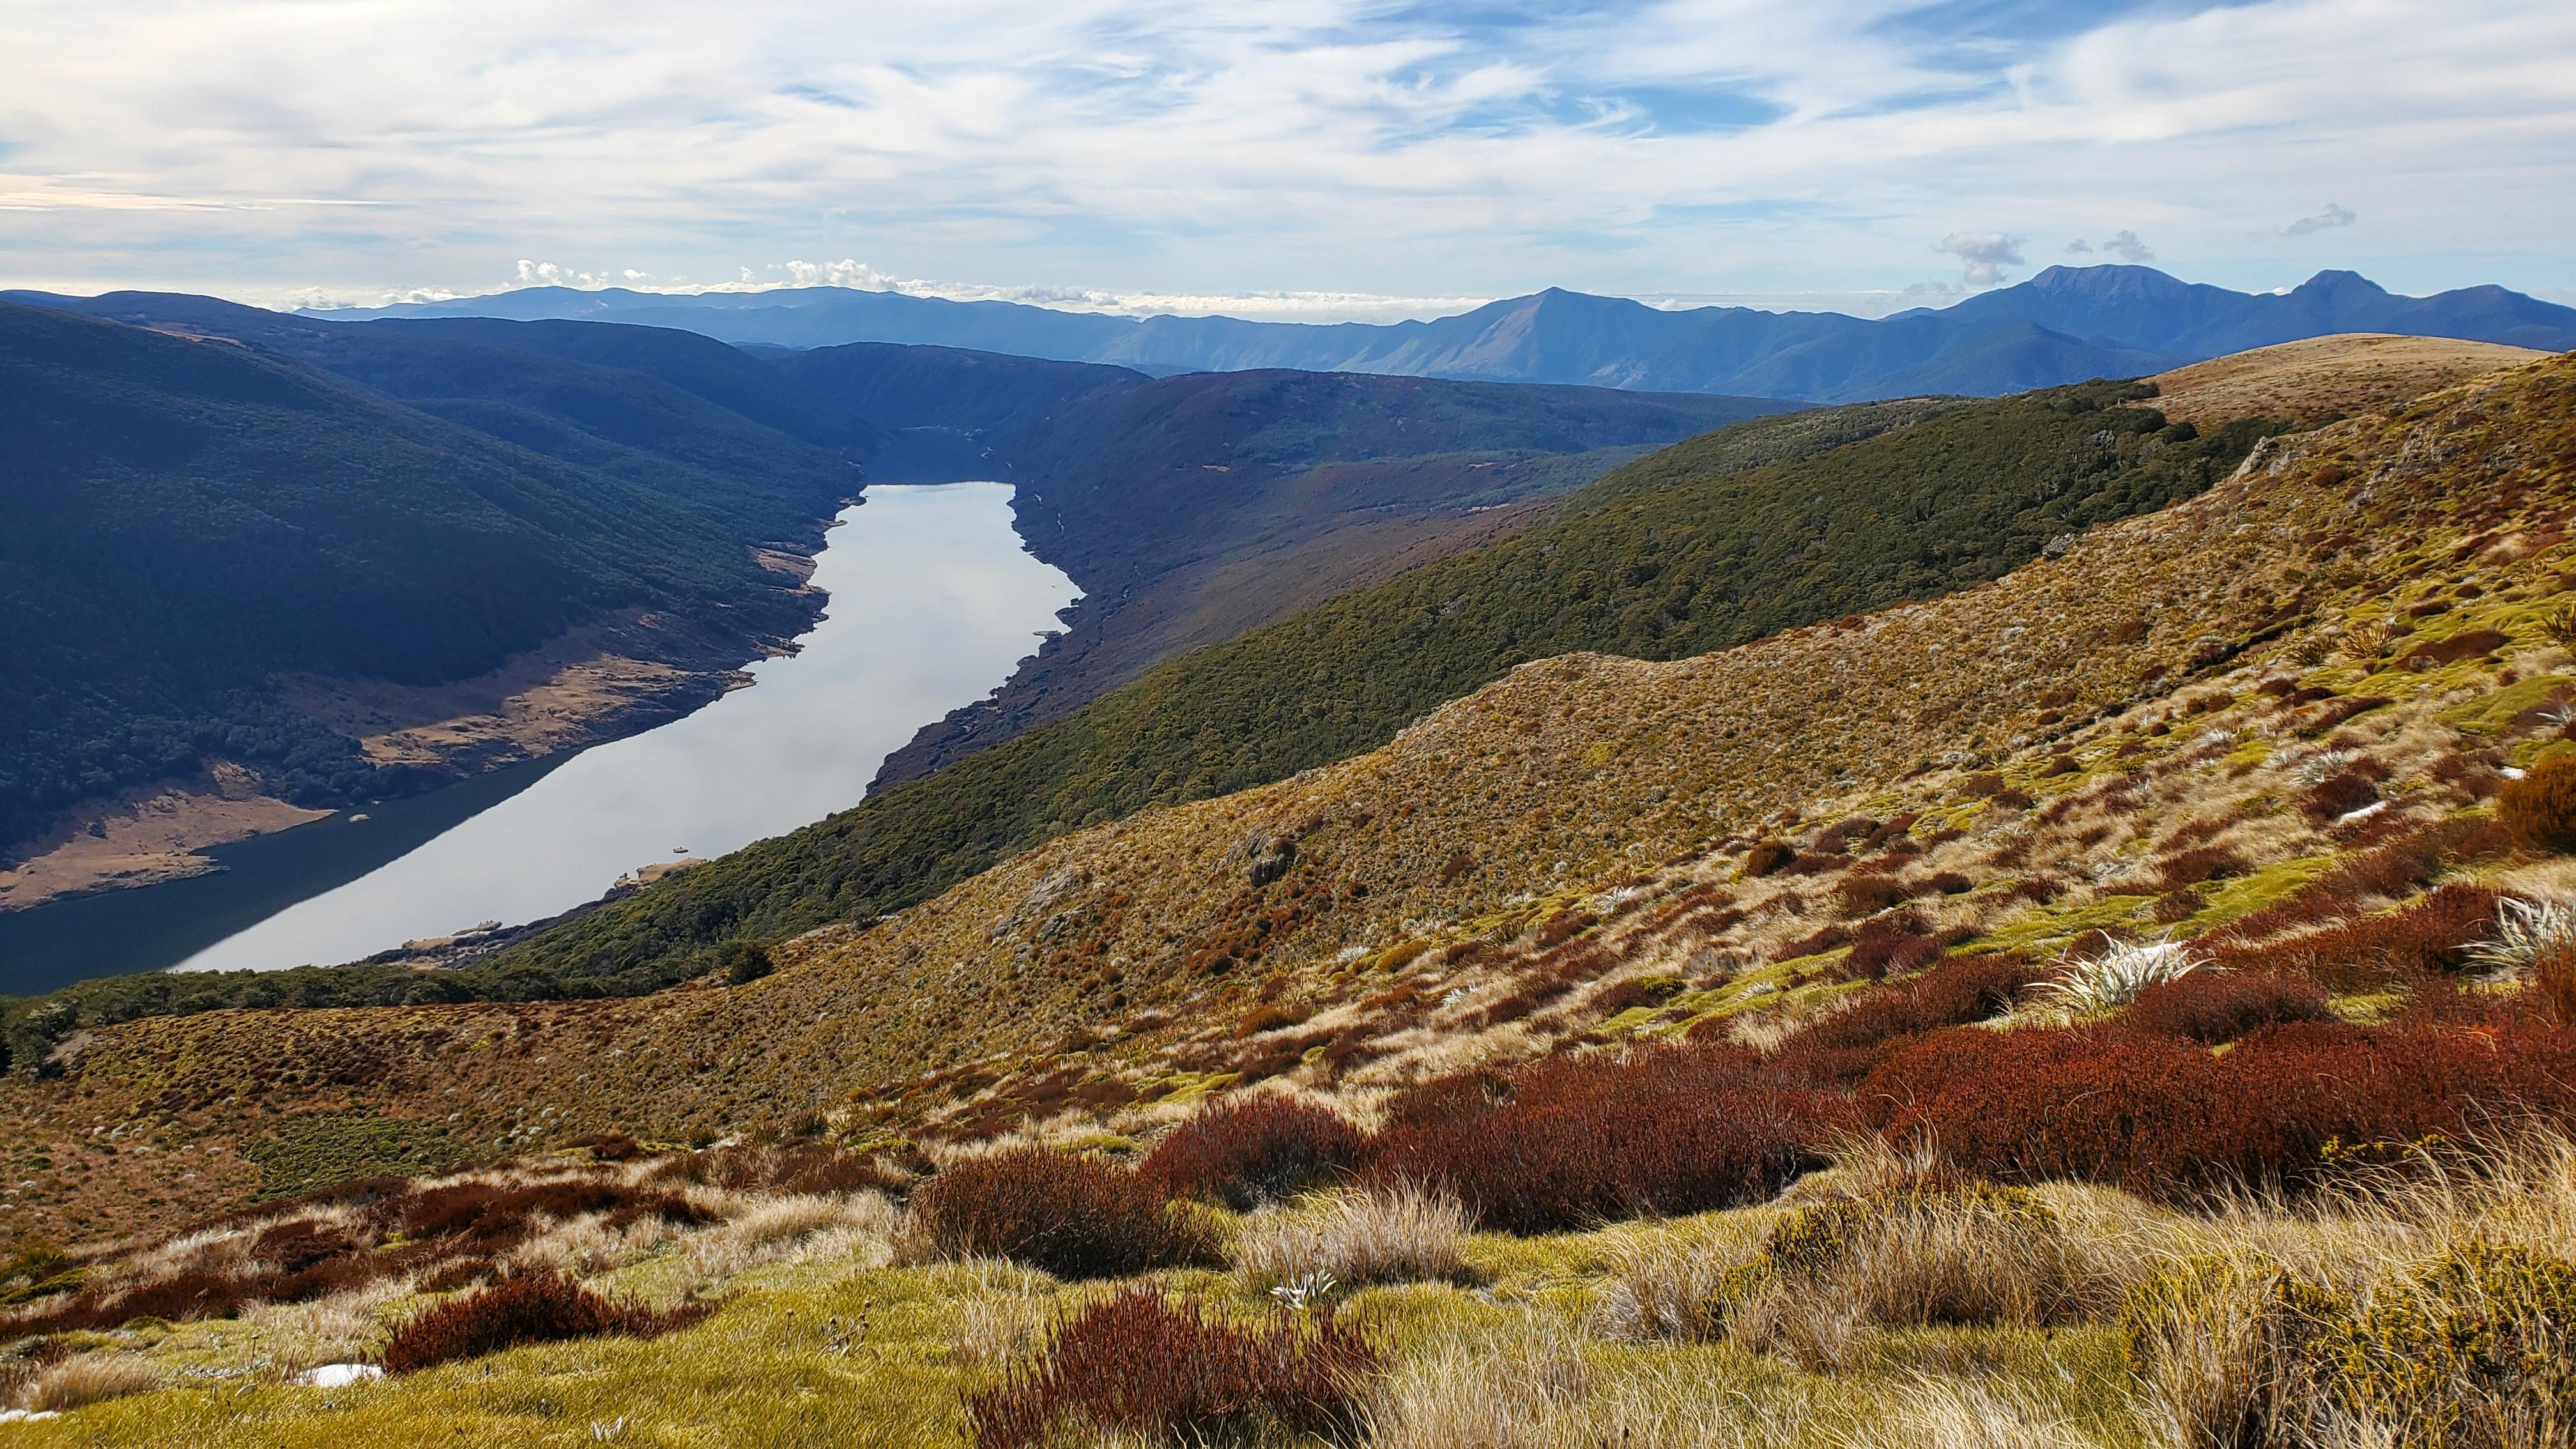 Cobb Reservoir and ridge